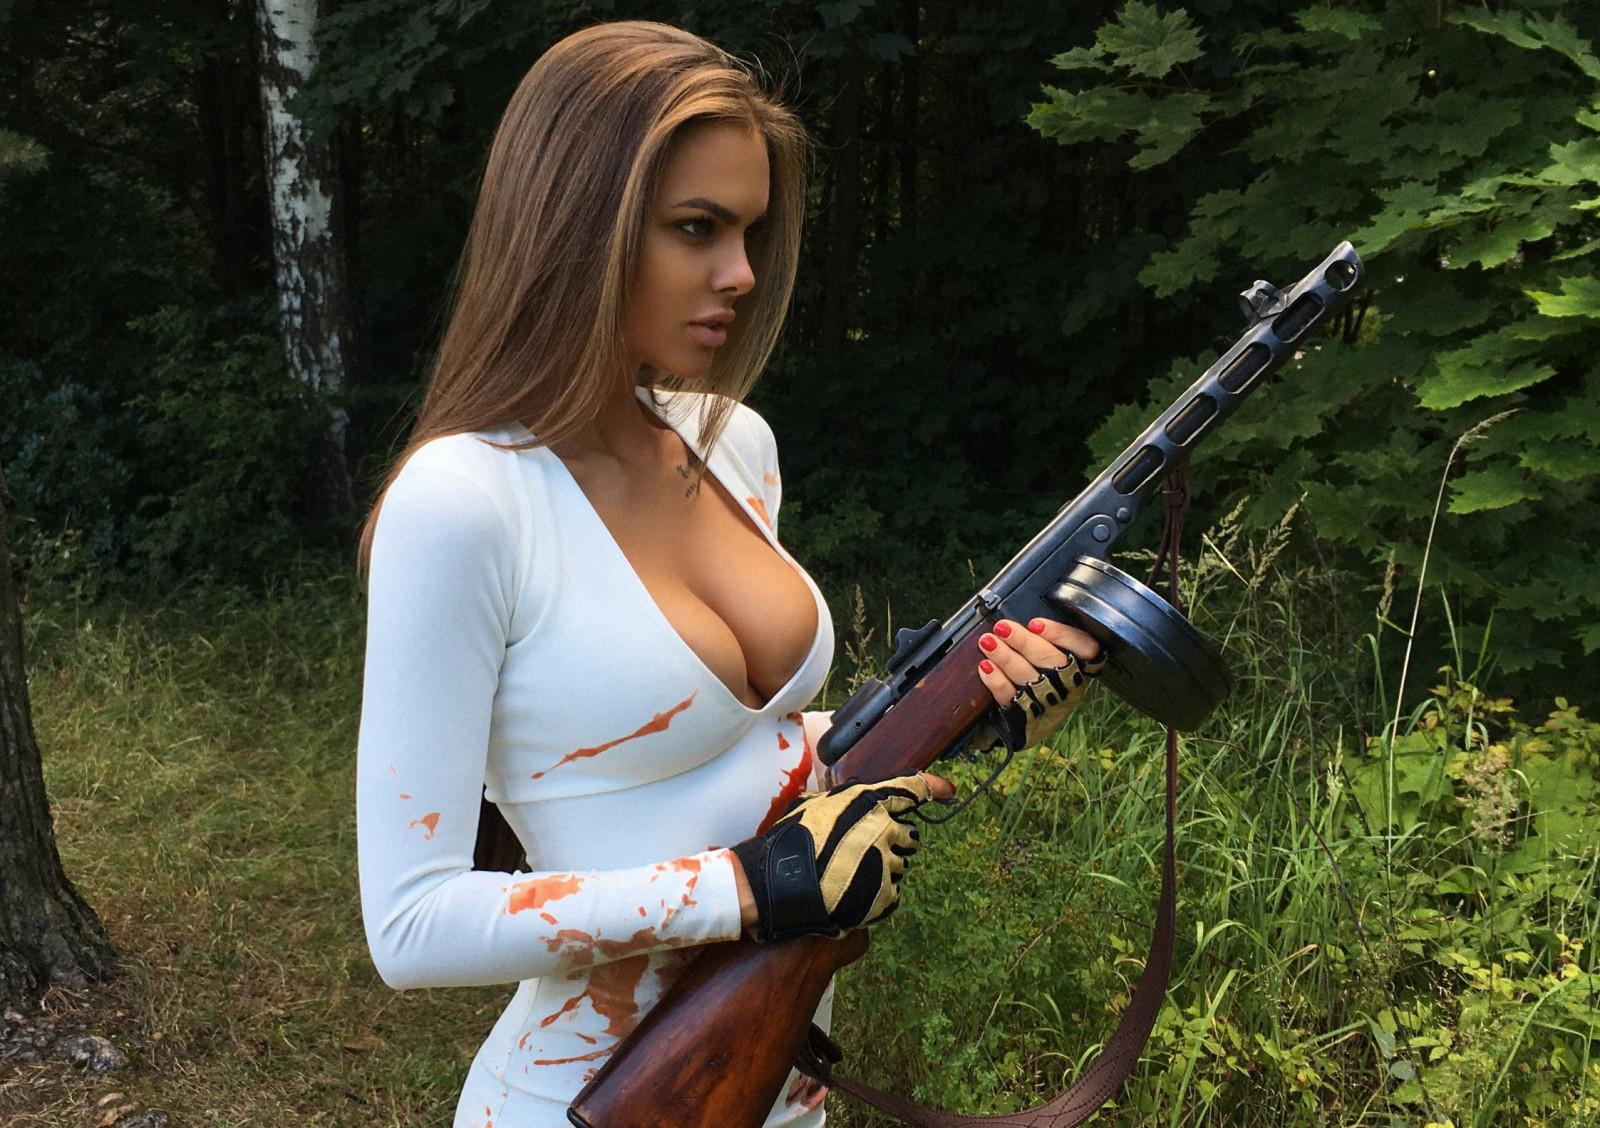 https://c.wallhere.com/photos/e9/ab/Viki_Odintcova_boobs_blood_women_model_PPSh_41_girls_with_guns-274272.jpg!d